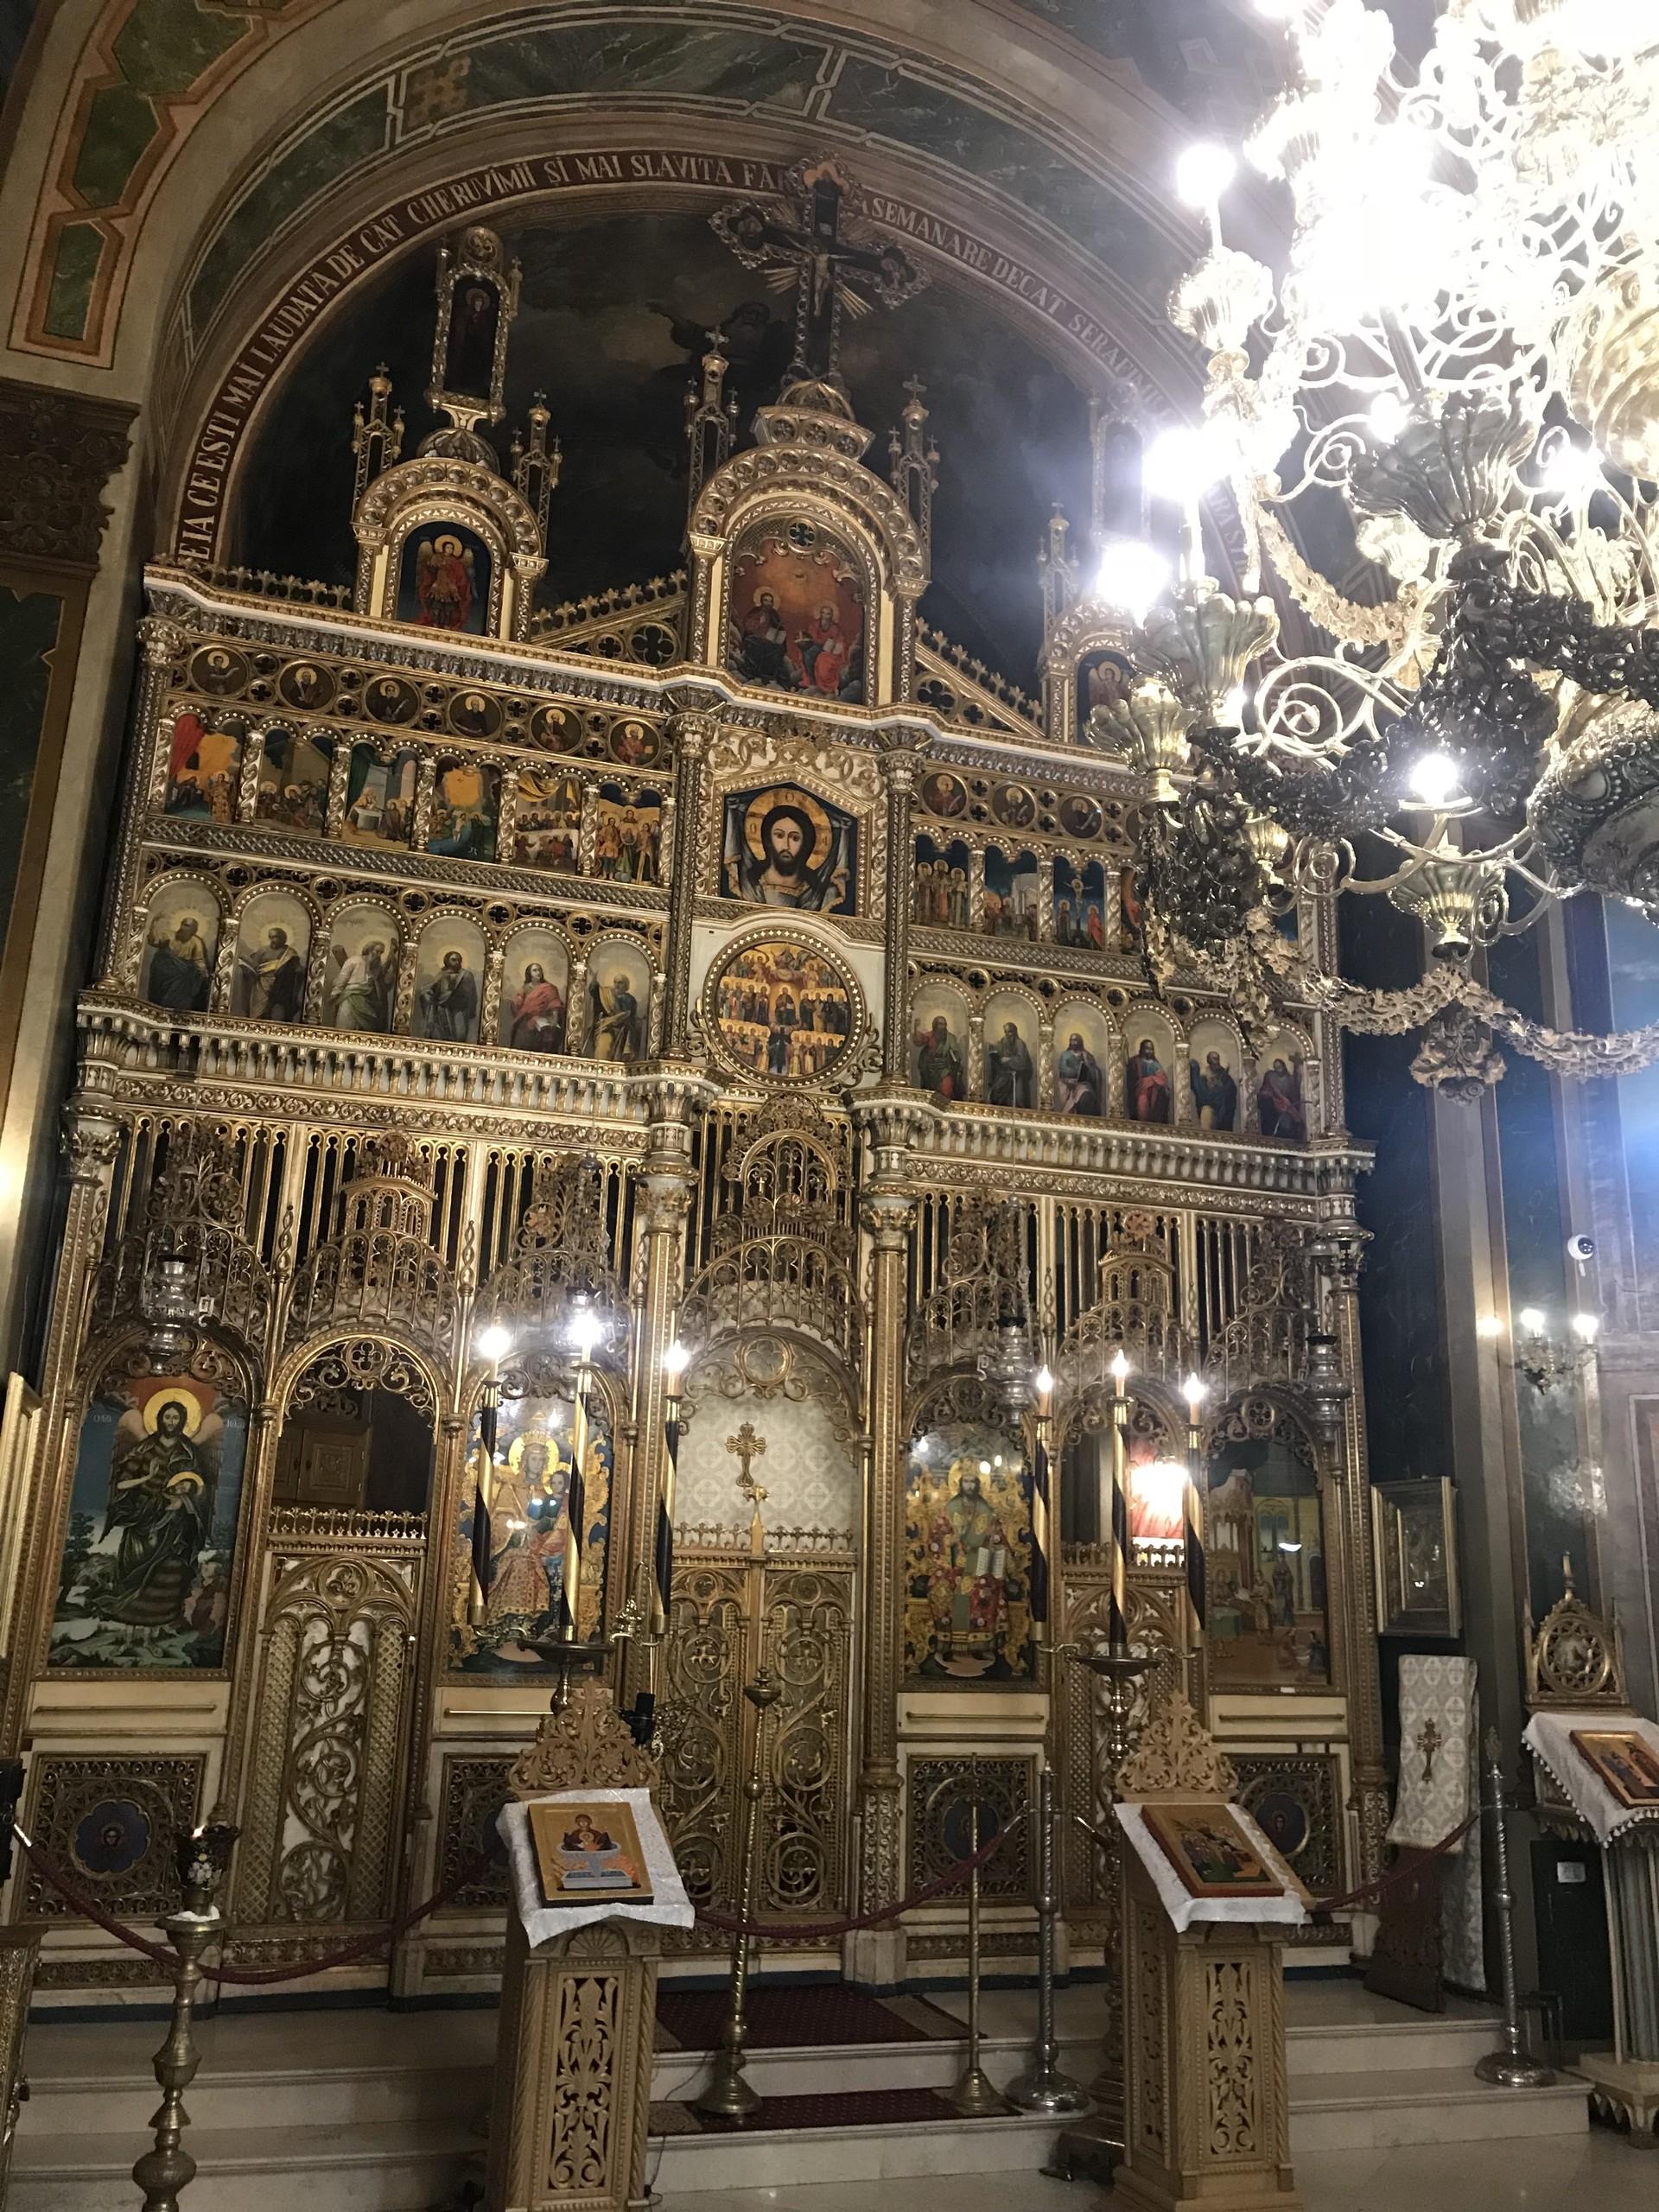 biserica-zlatari-c5522afb4cfc63fbd2c5226